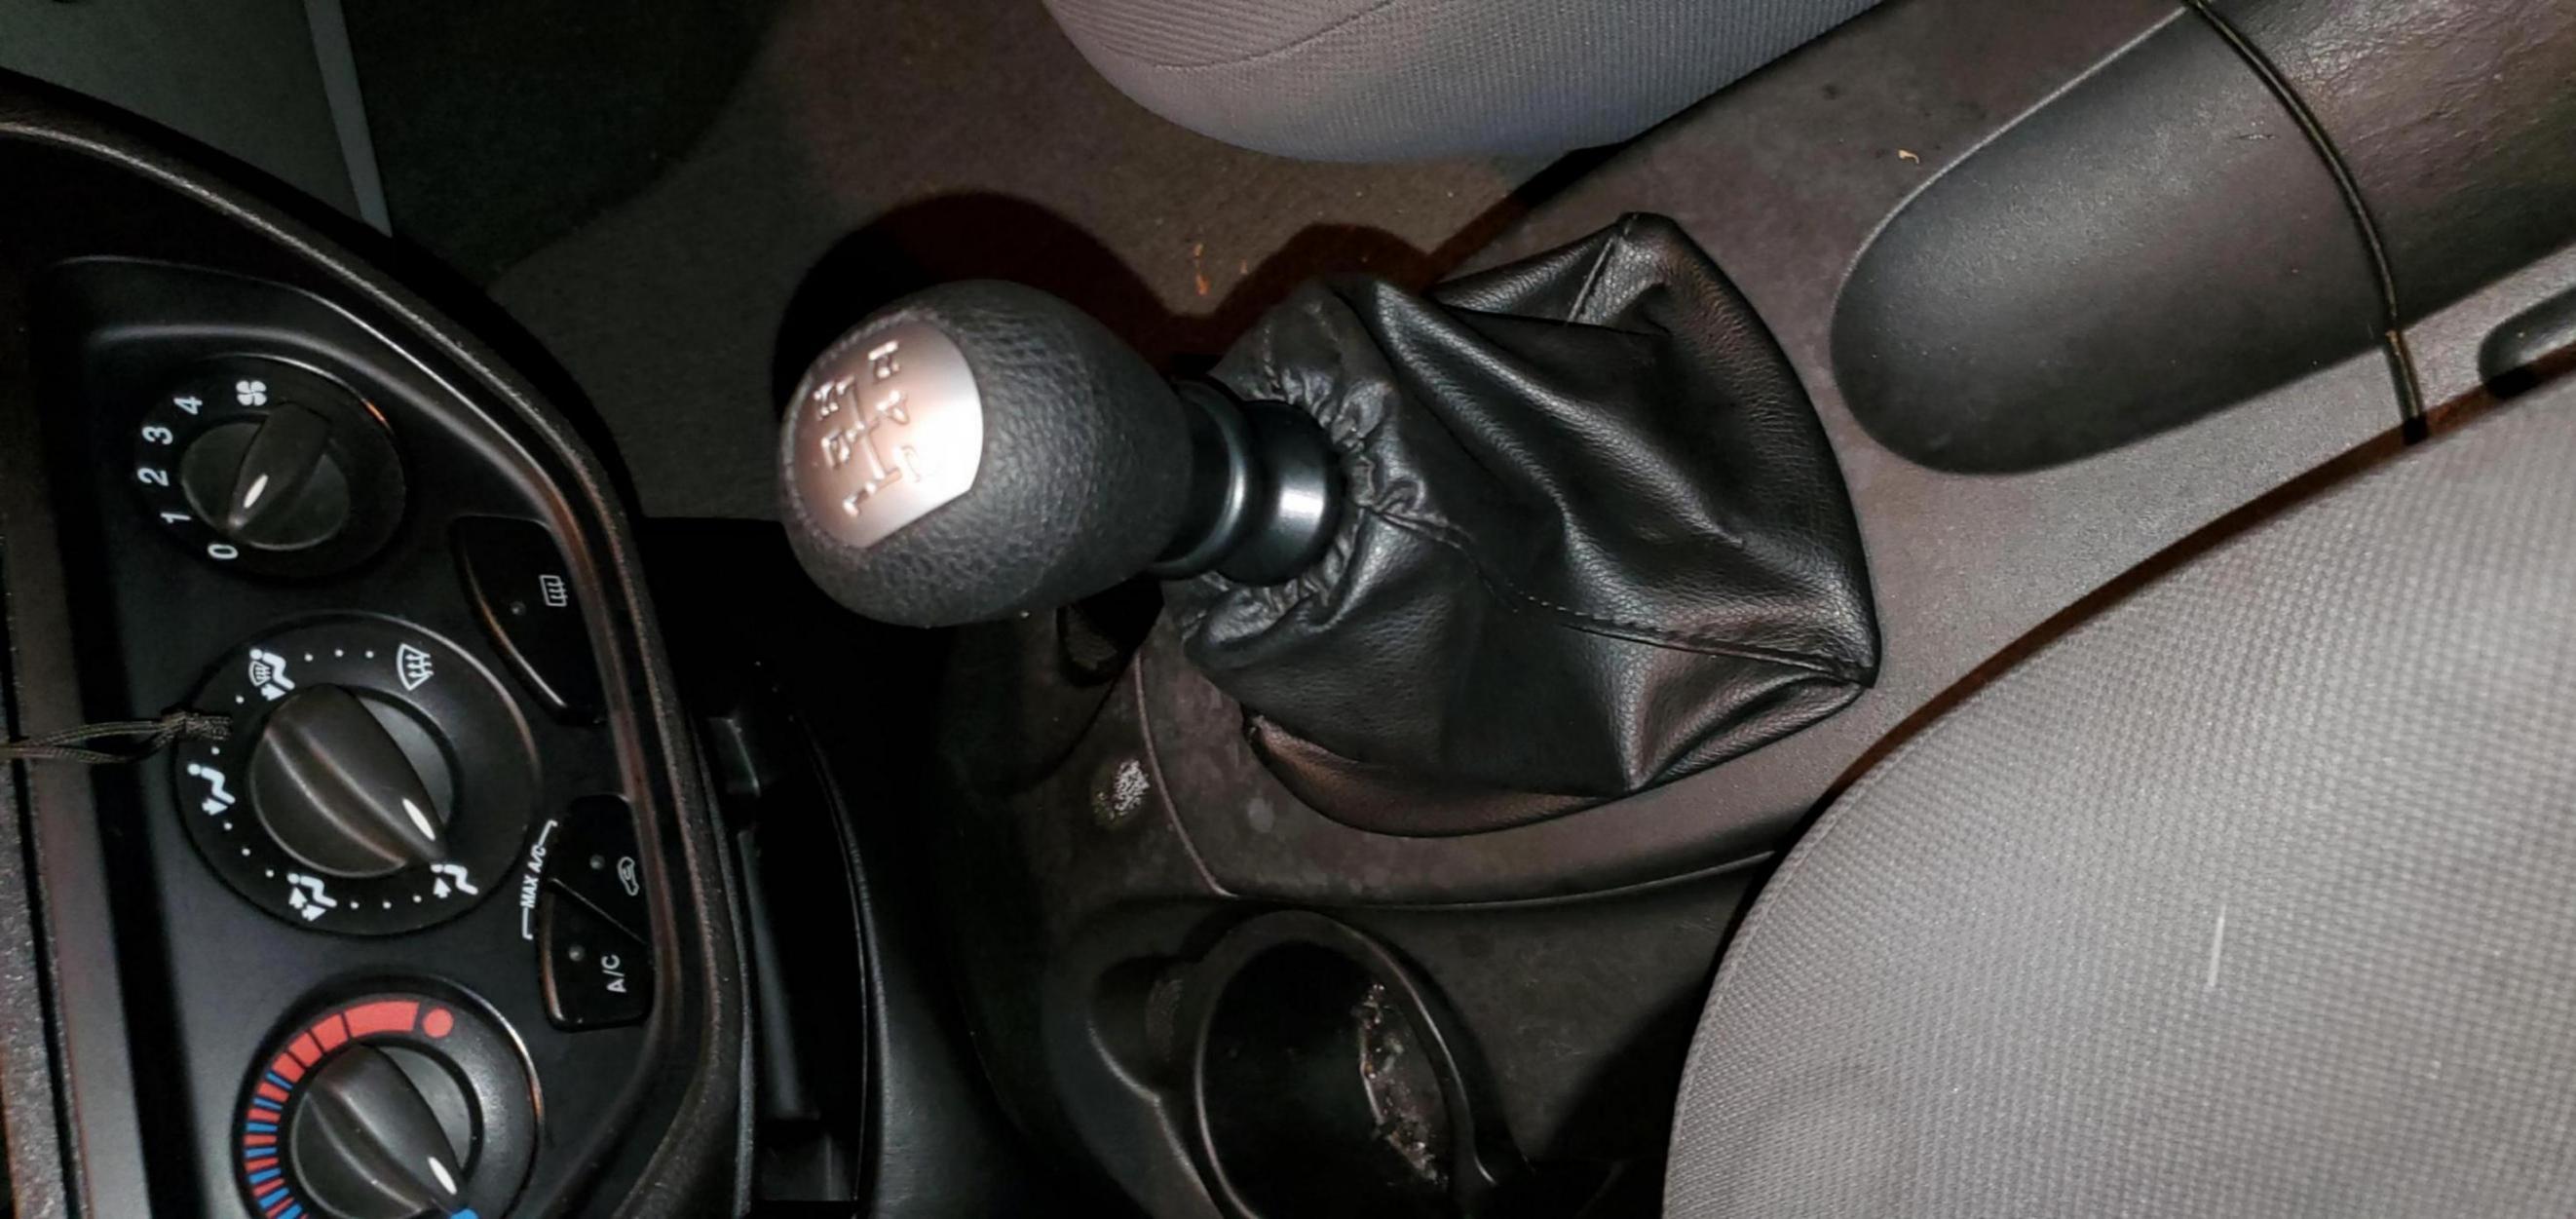 Need to replace shift knob (Manual)-20191002_201209_1571985100779.jpg